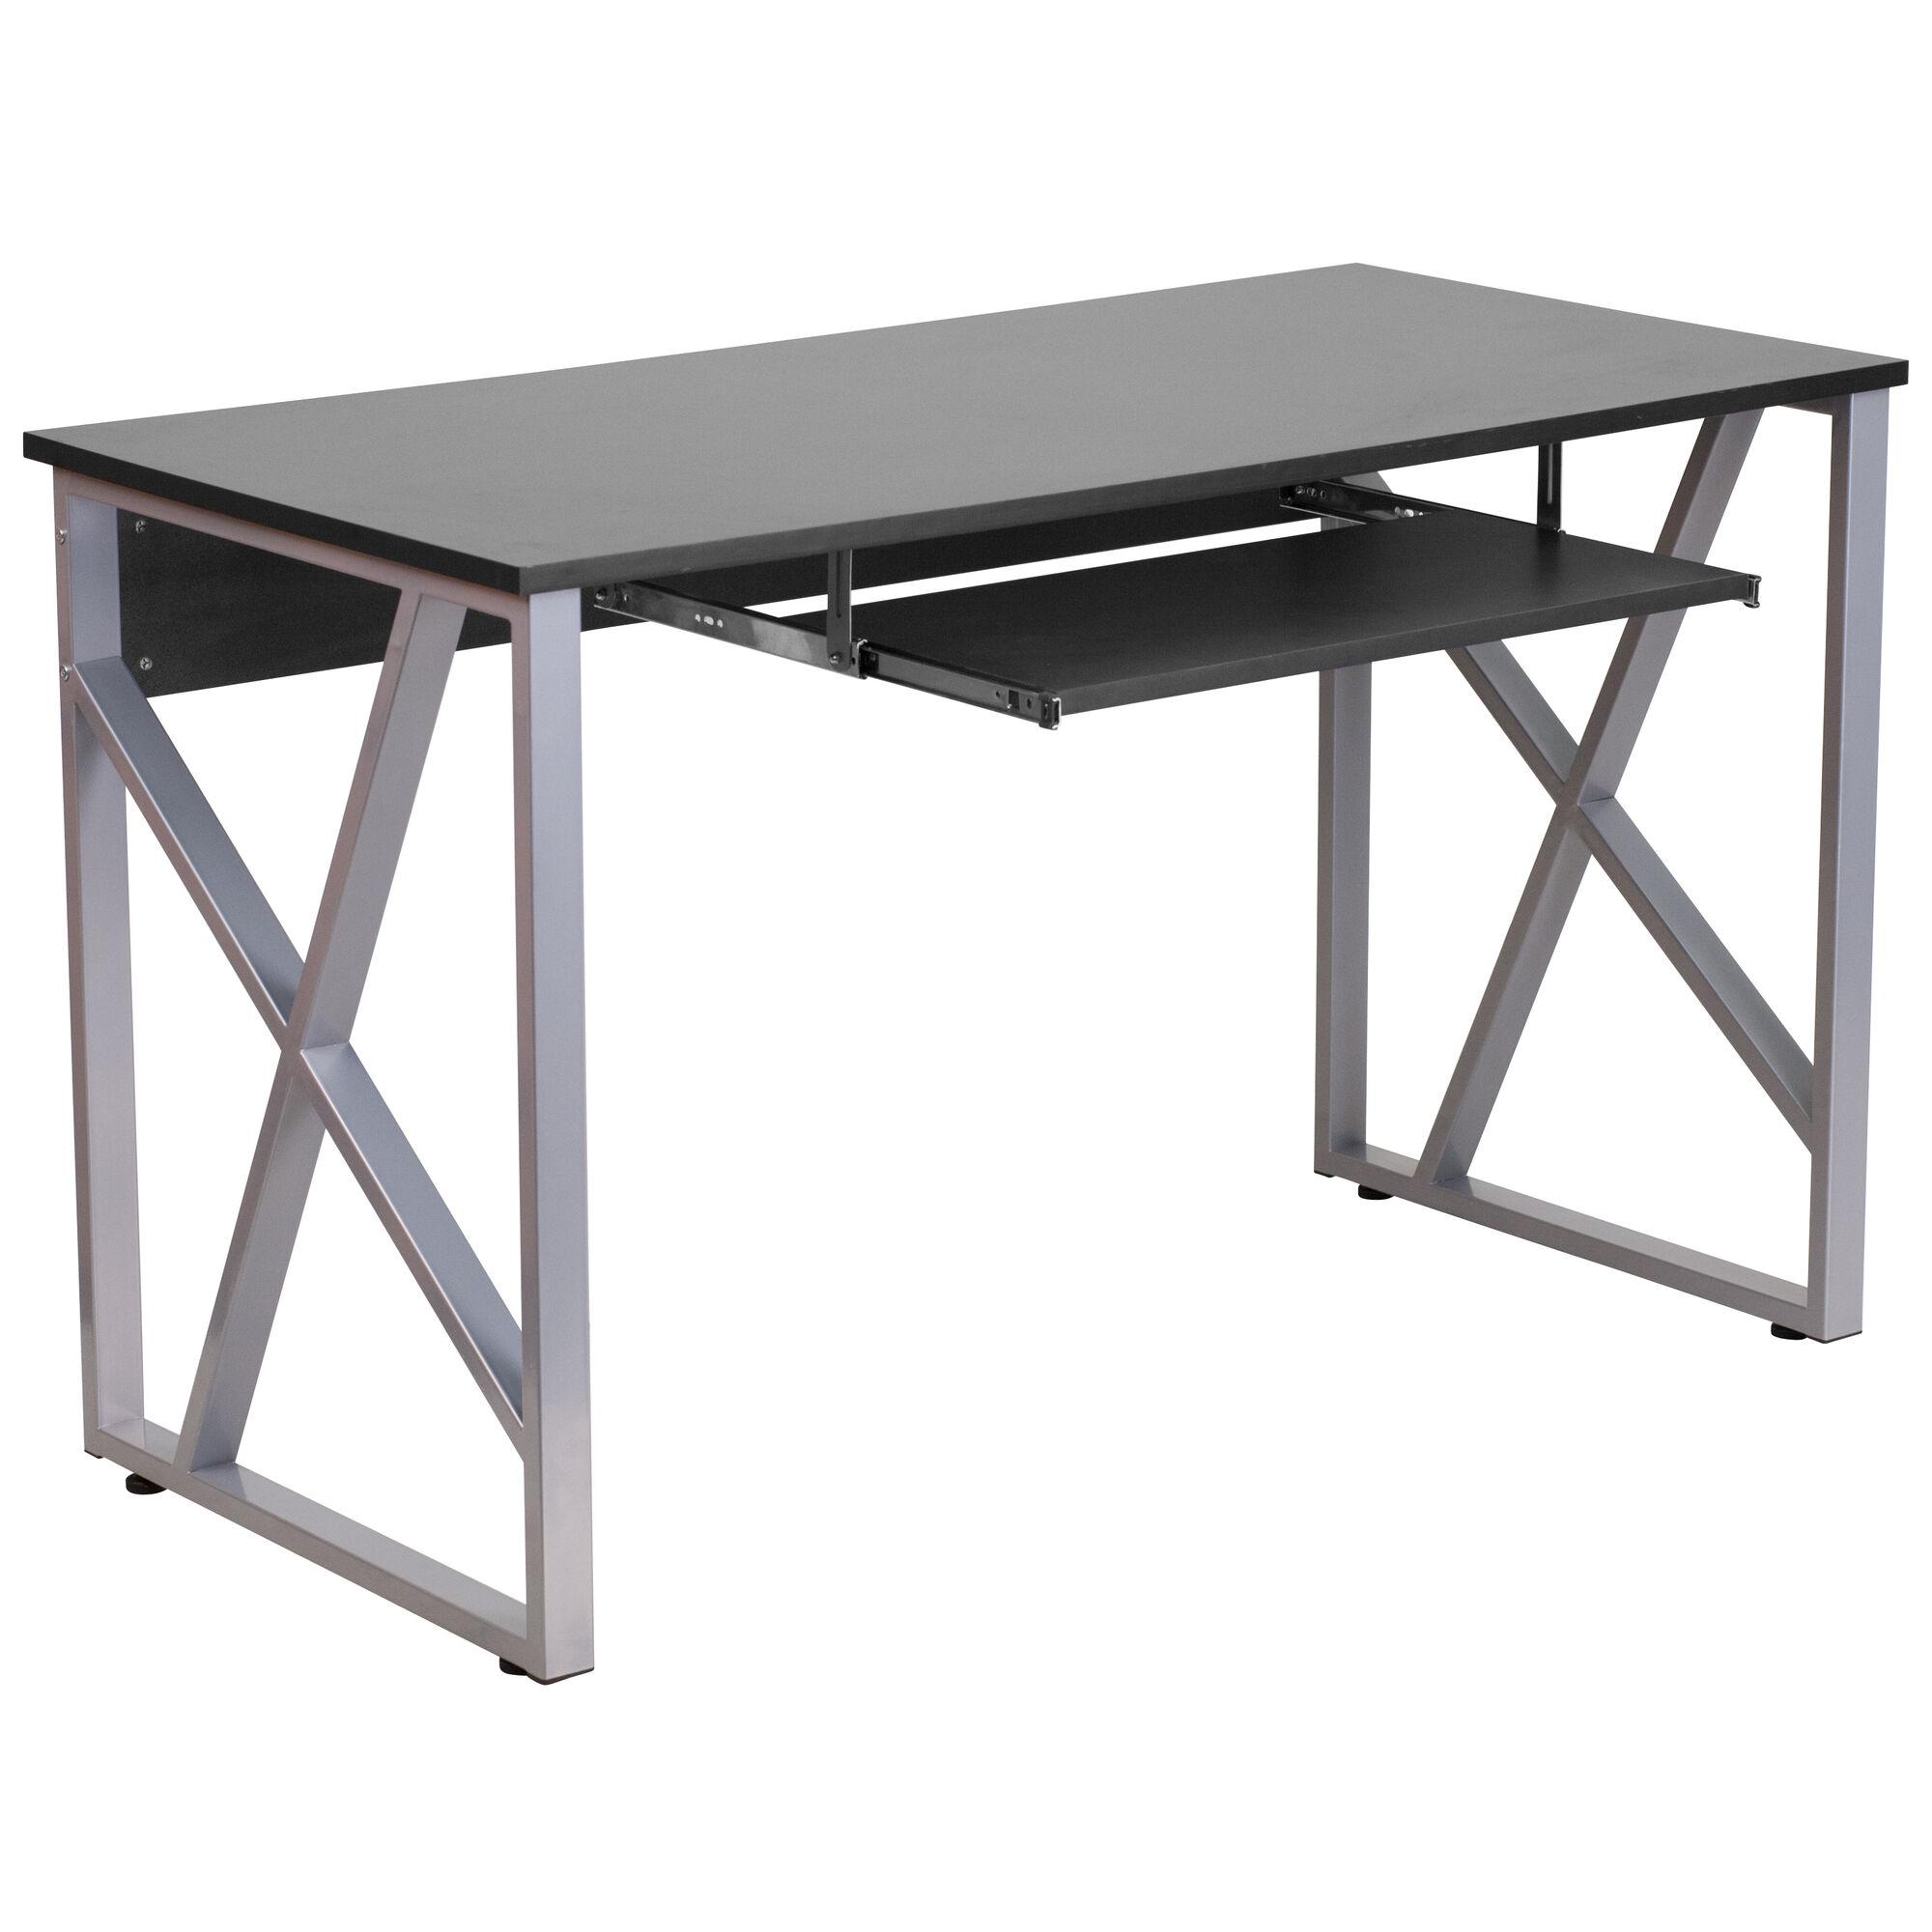 Flash Furniture Nan Wk 004 Gg